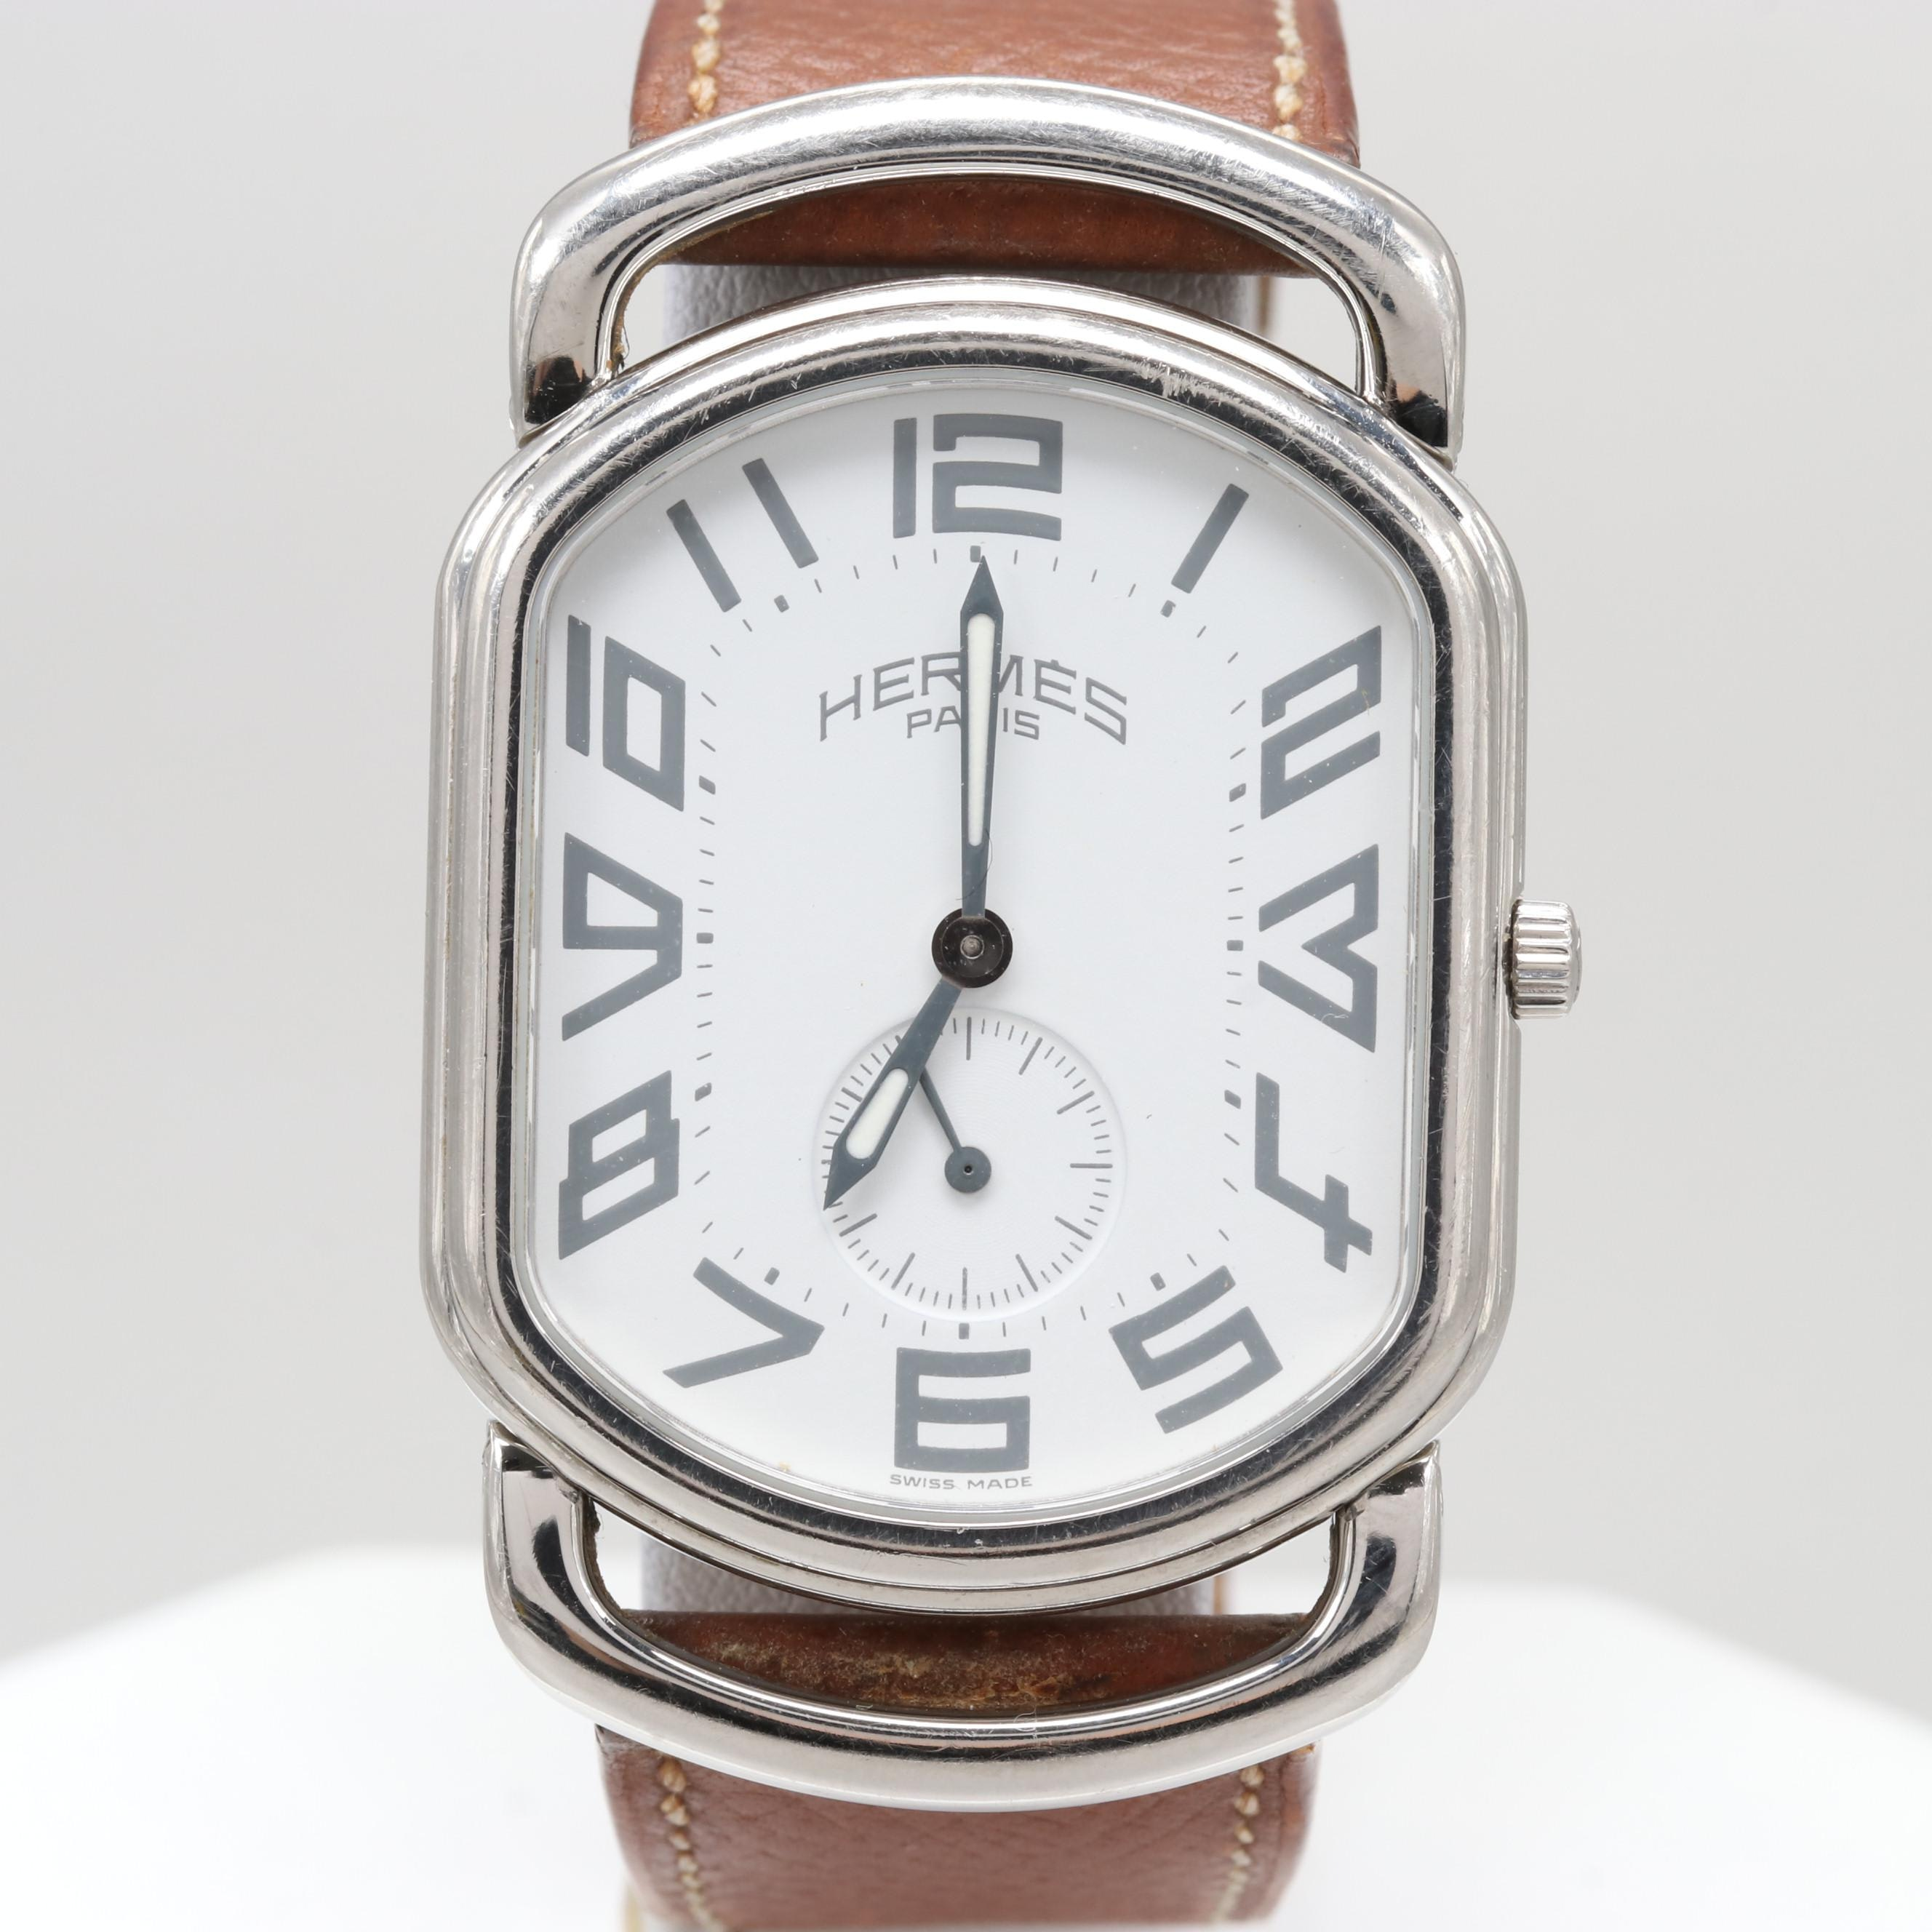 Hermes Rally Model RA1.810 Quartz Wristwatch